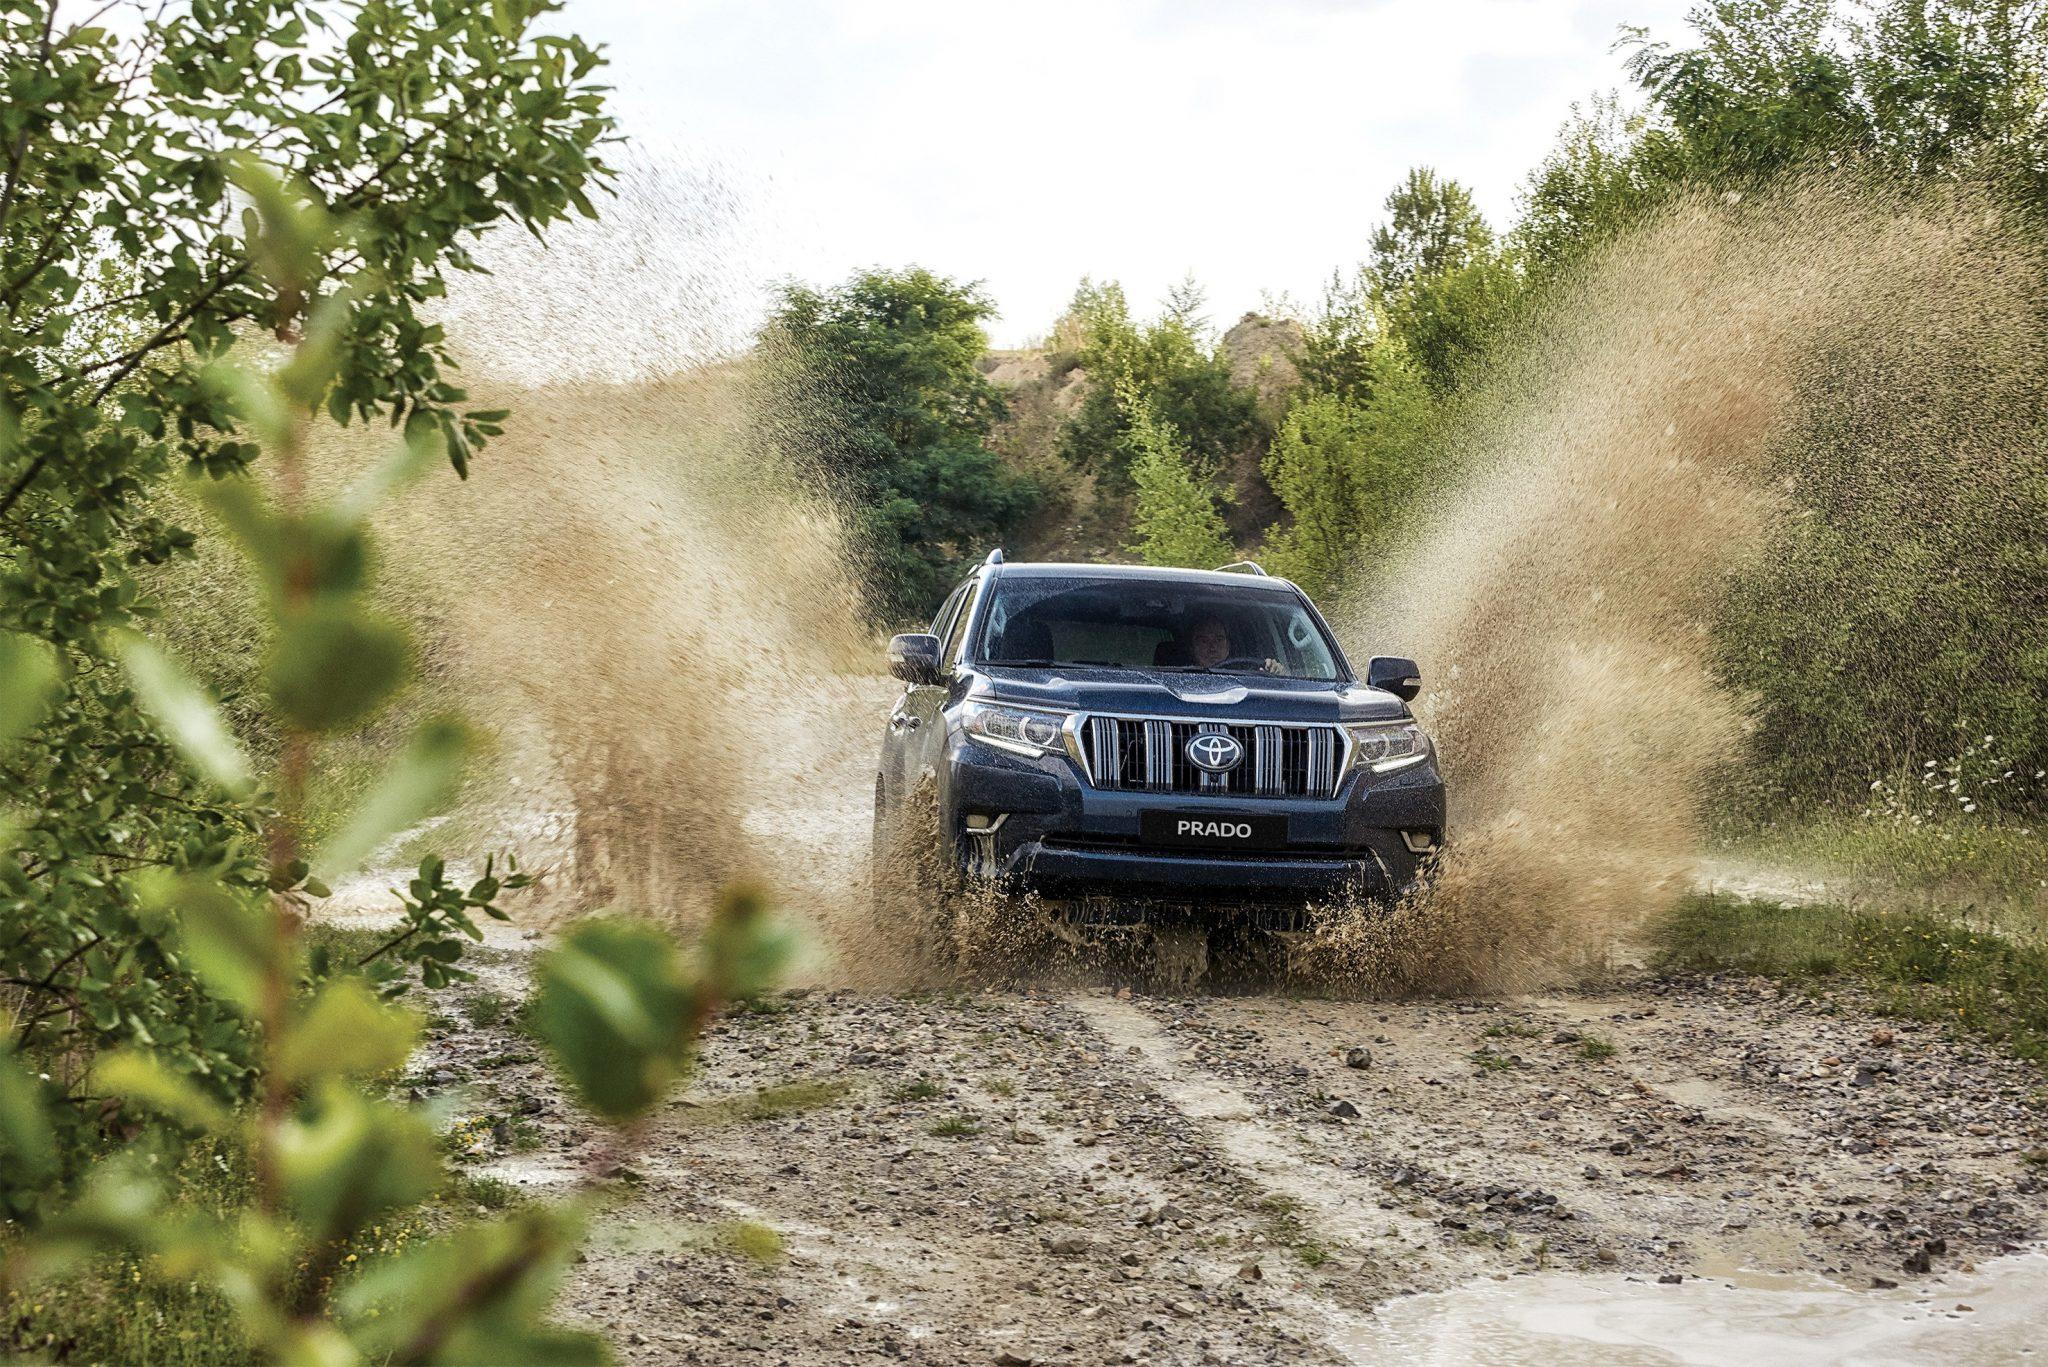 2018 LandCruiser Prado revealed